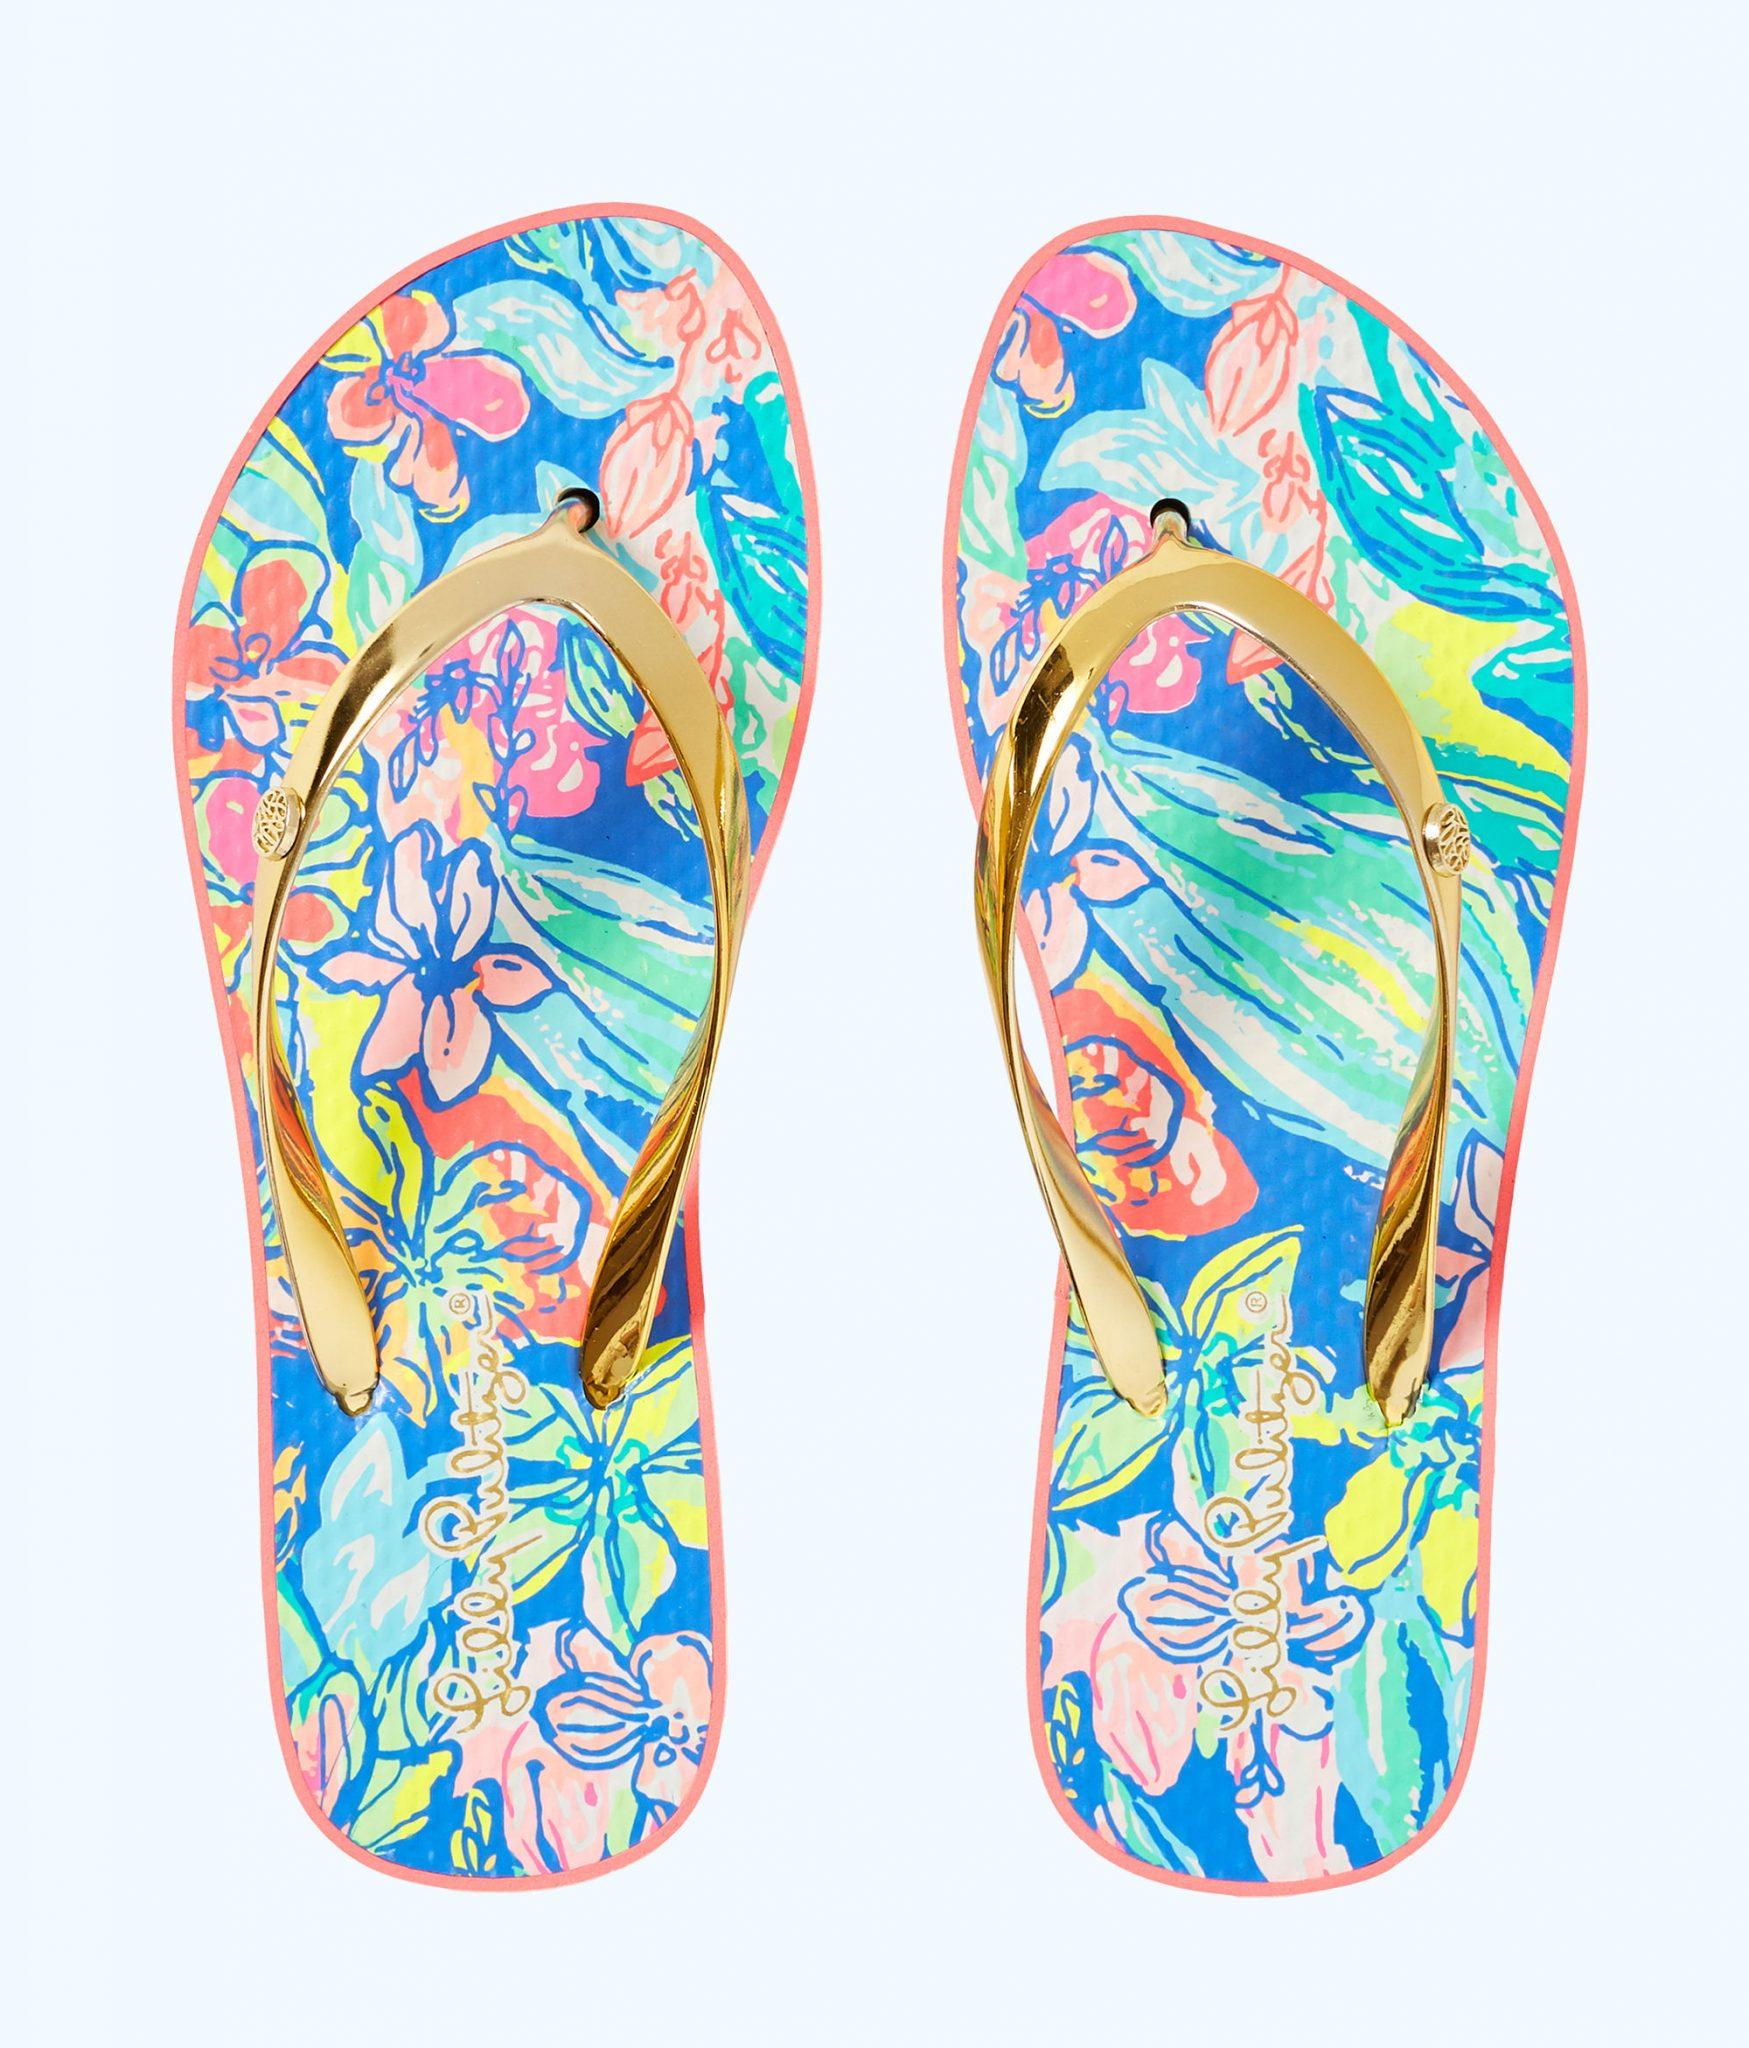 ff024371df8 POOL FLIP-FLOP - SURF GYPSEA - Lilly Pulitzer Store - Life s a Beach